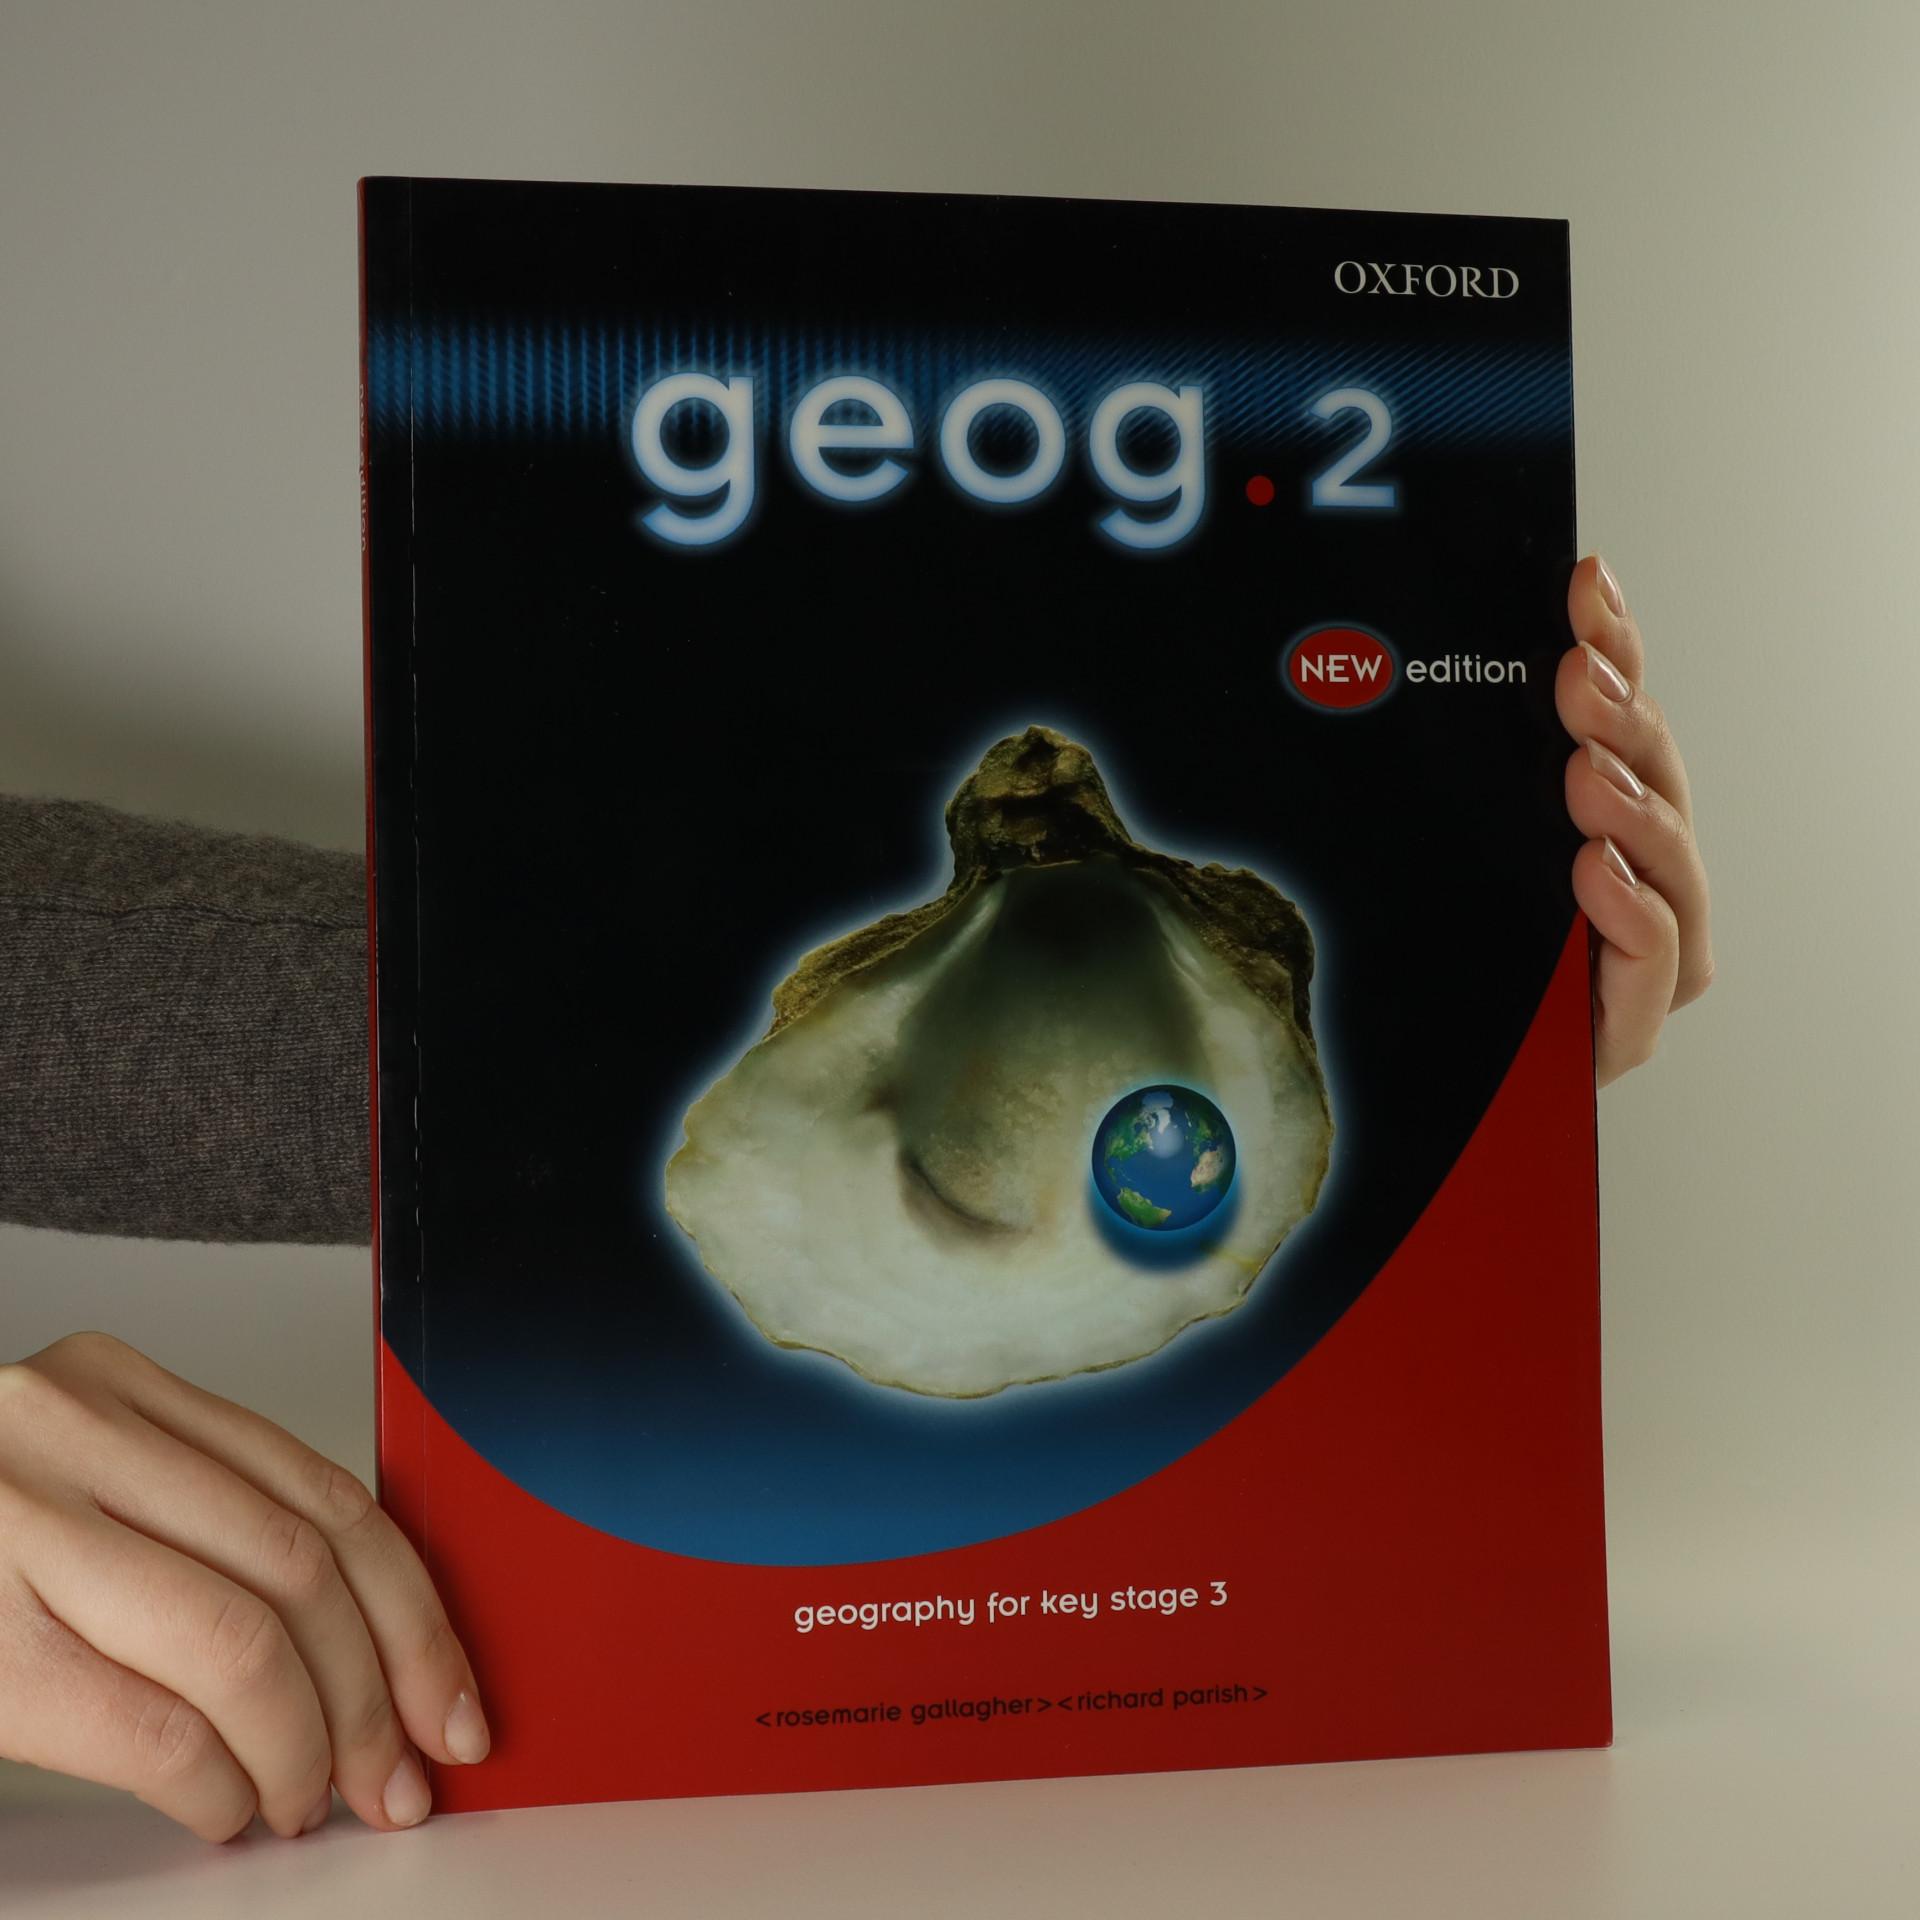 antikvární kniha Geog. 2. Geography for key stage 3, 2005